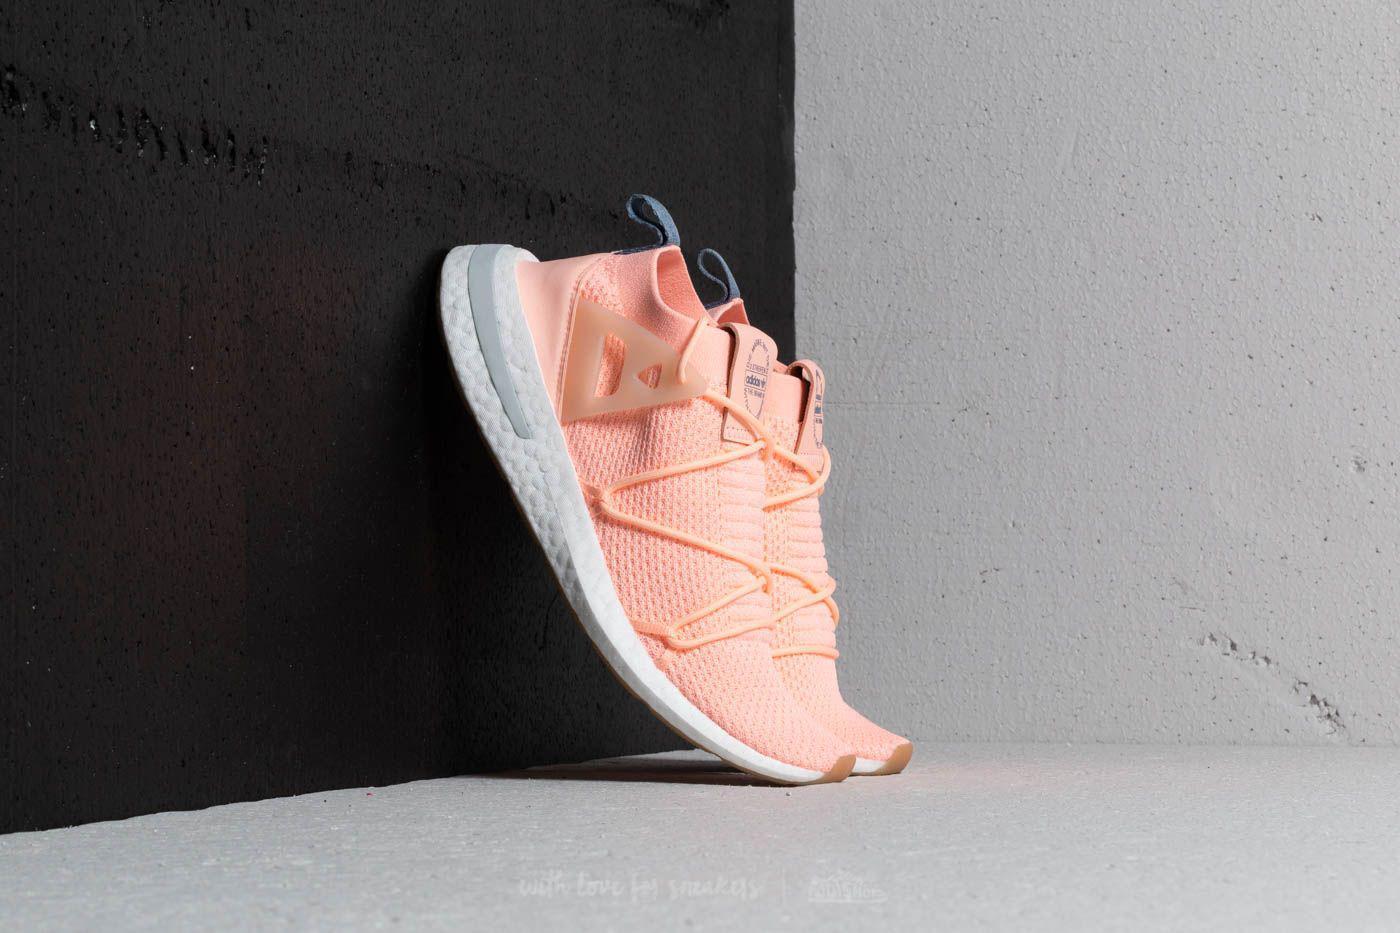 Lyst Adidas Originali Adidas Arkyn Primeknit W / Arancione Chiaro Chiaro